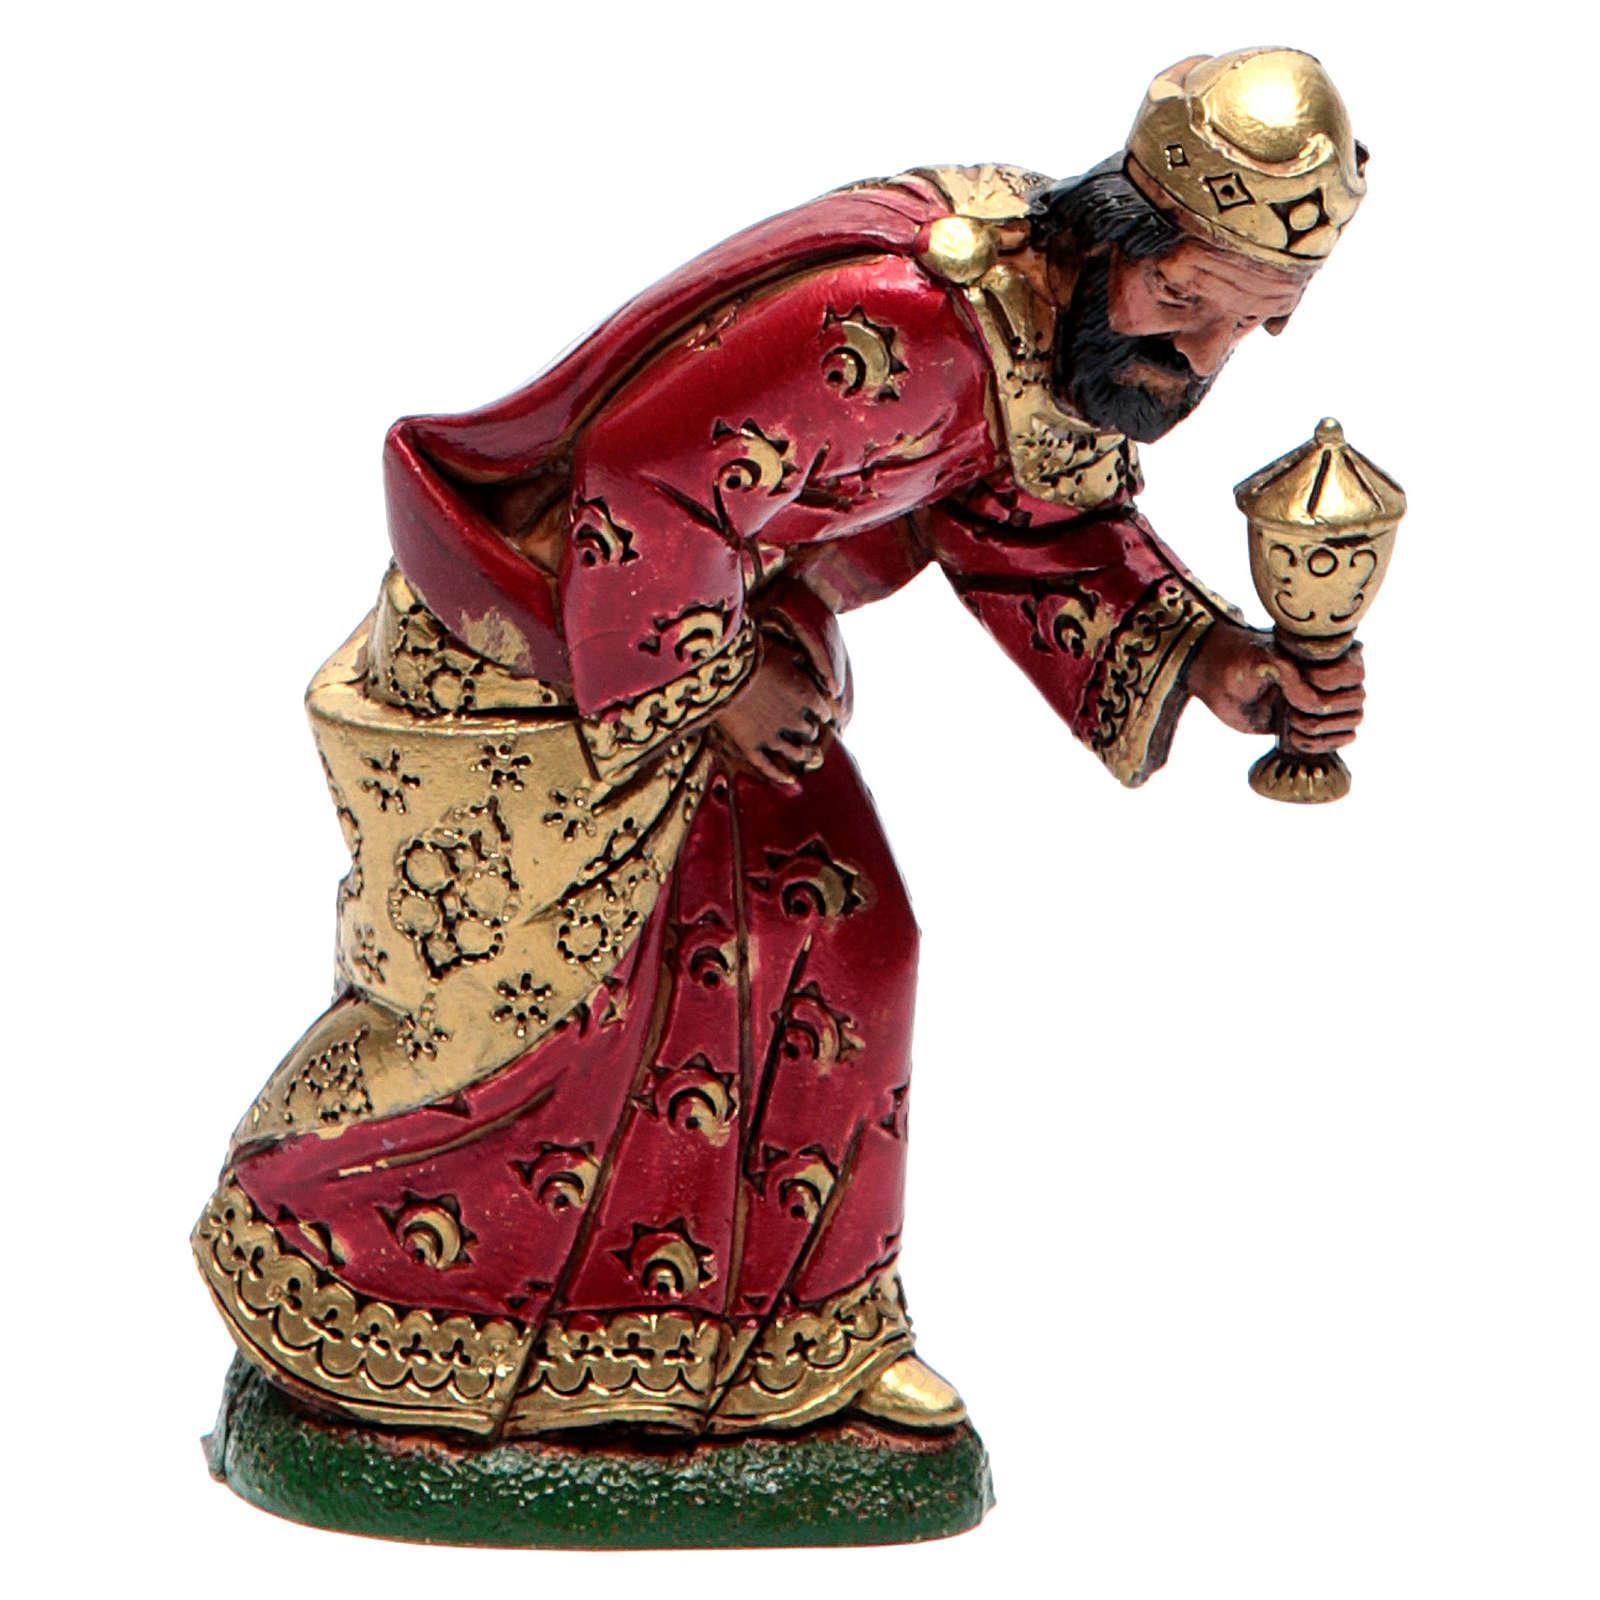 Moranduzzo nativity scene figurine 12cm, mulatto wise king 4